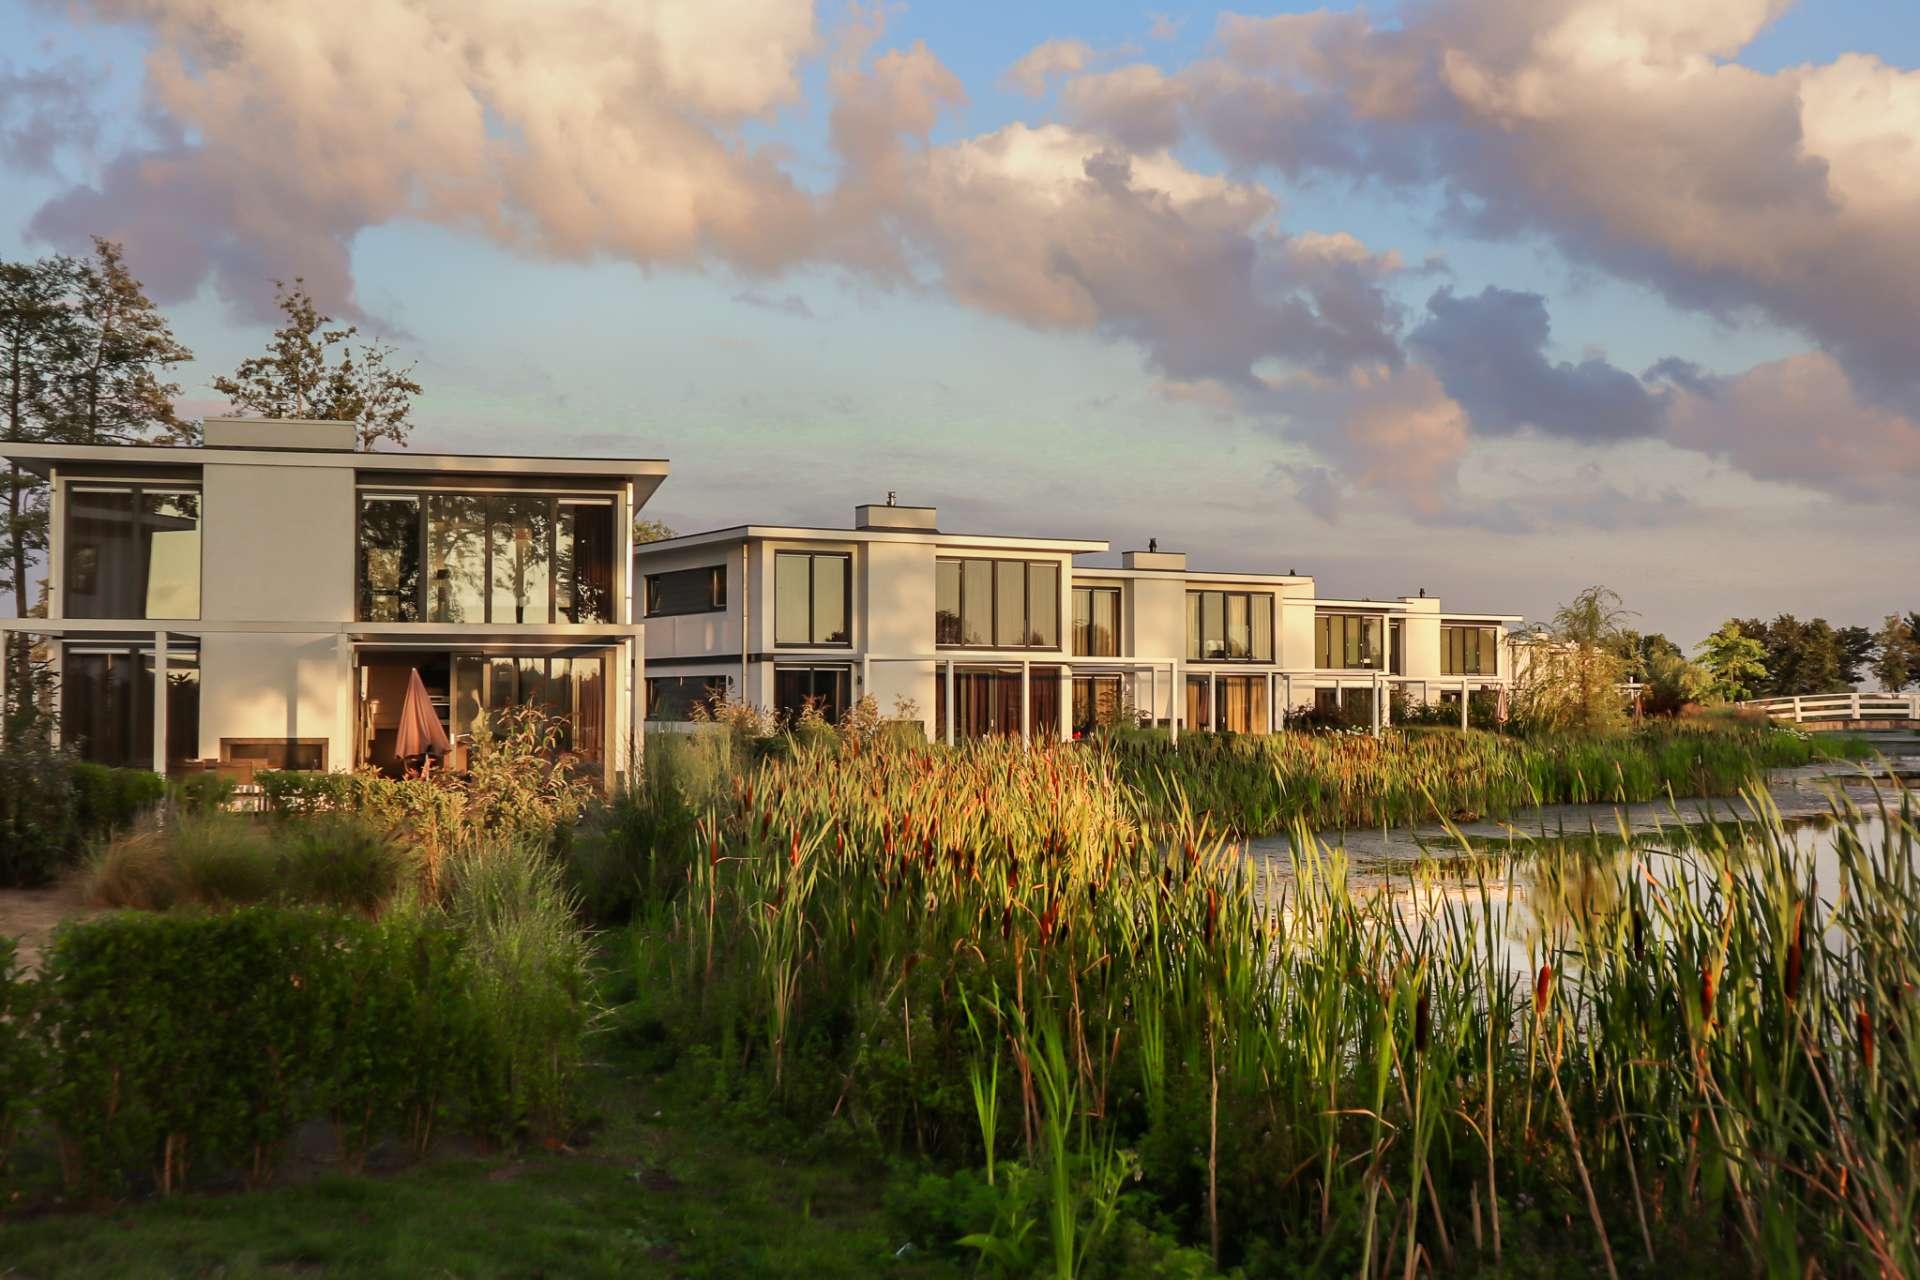 header-park-accommodations-water-europarcs-bad-hulckesteijn